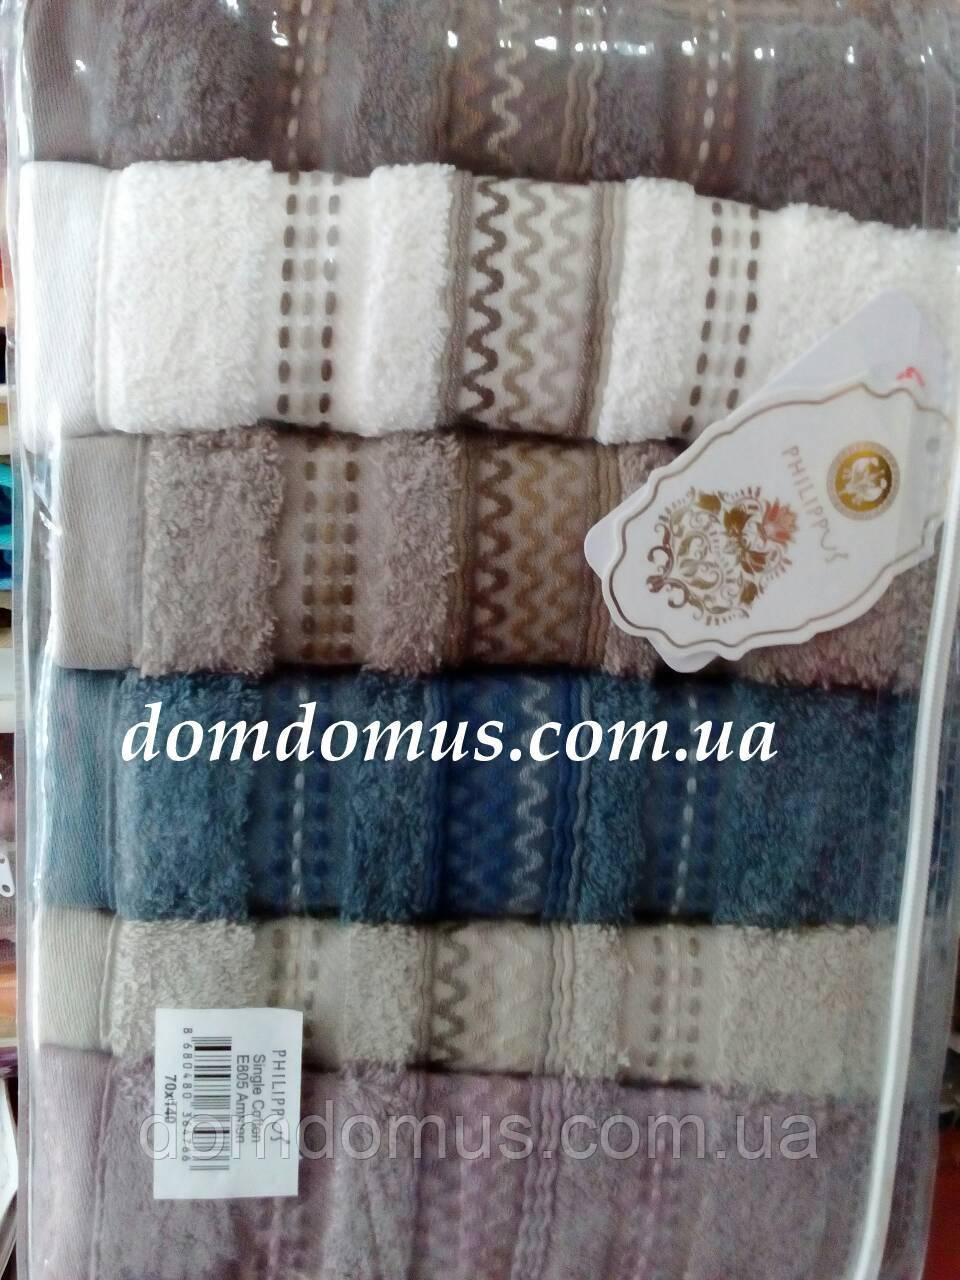 "Махровое полотенце ""Ammon"" 70*140 Philippus 6 шт./уп, Турция"